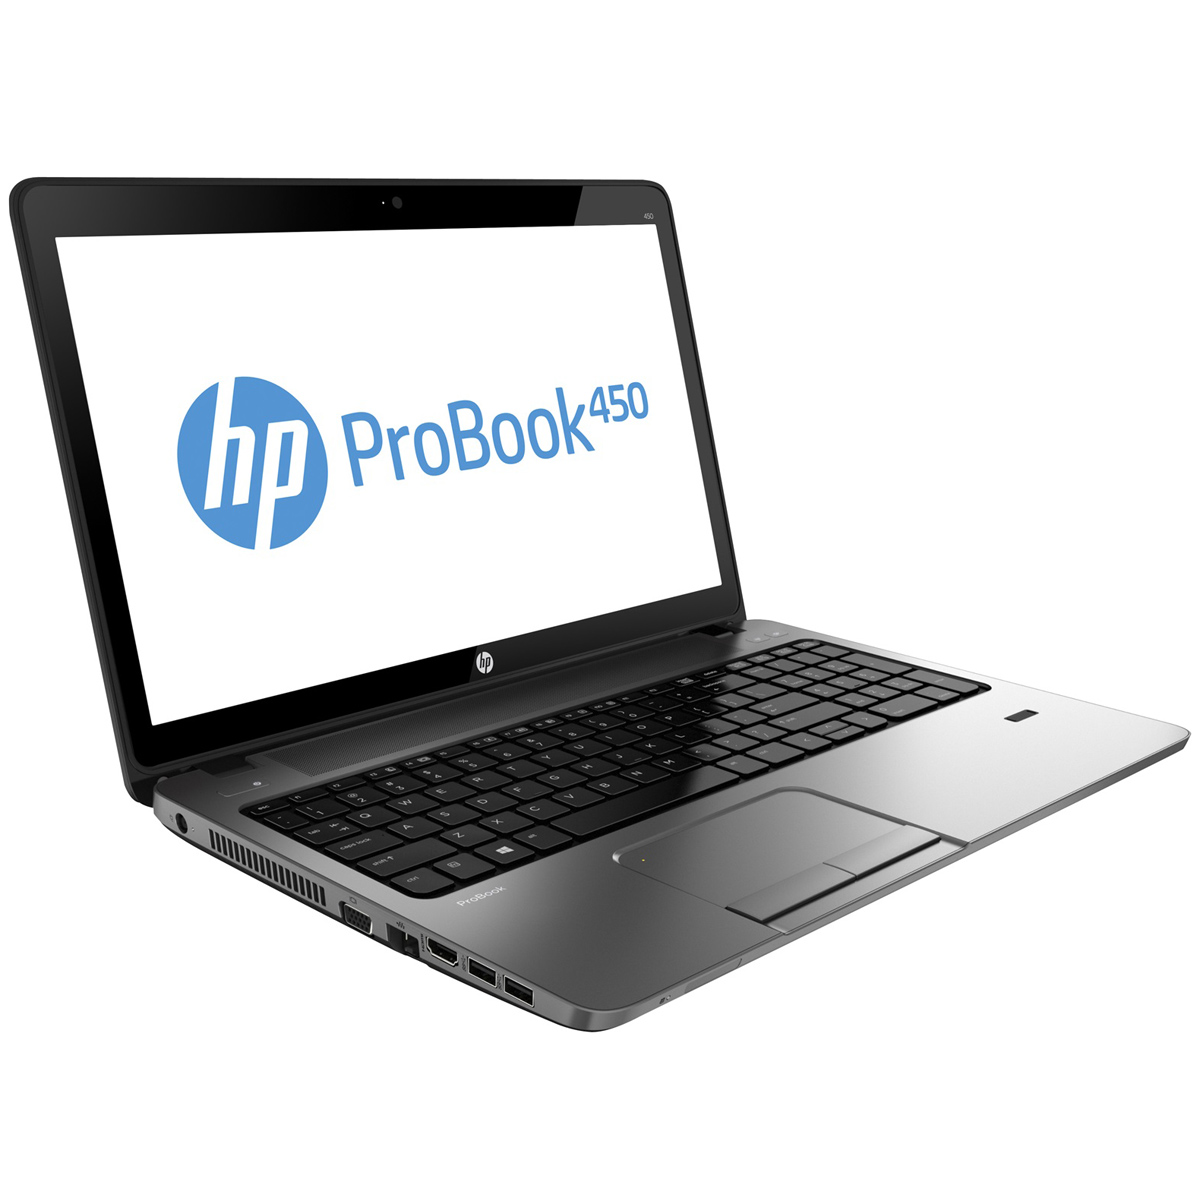 "PC portable HP ProBook 450 (E9Y09EA) Intel Core i3-4000M 4 Go 500 Go 15.6"" LED Graveur DVD Wi-Fi N/Bluetooth Webcam Windows 7 Professionnel 64 bits + Windows 8 Pro 64 bits"